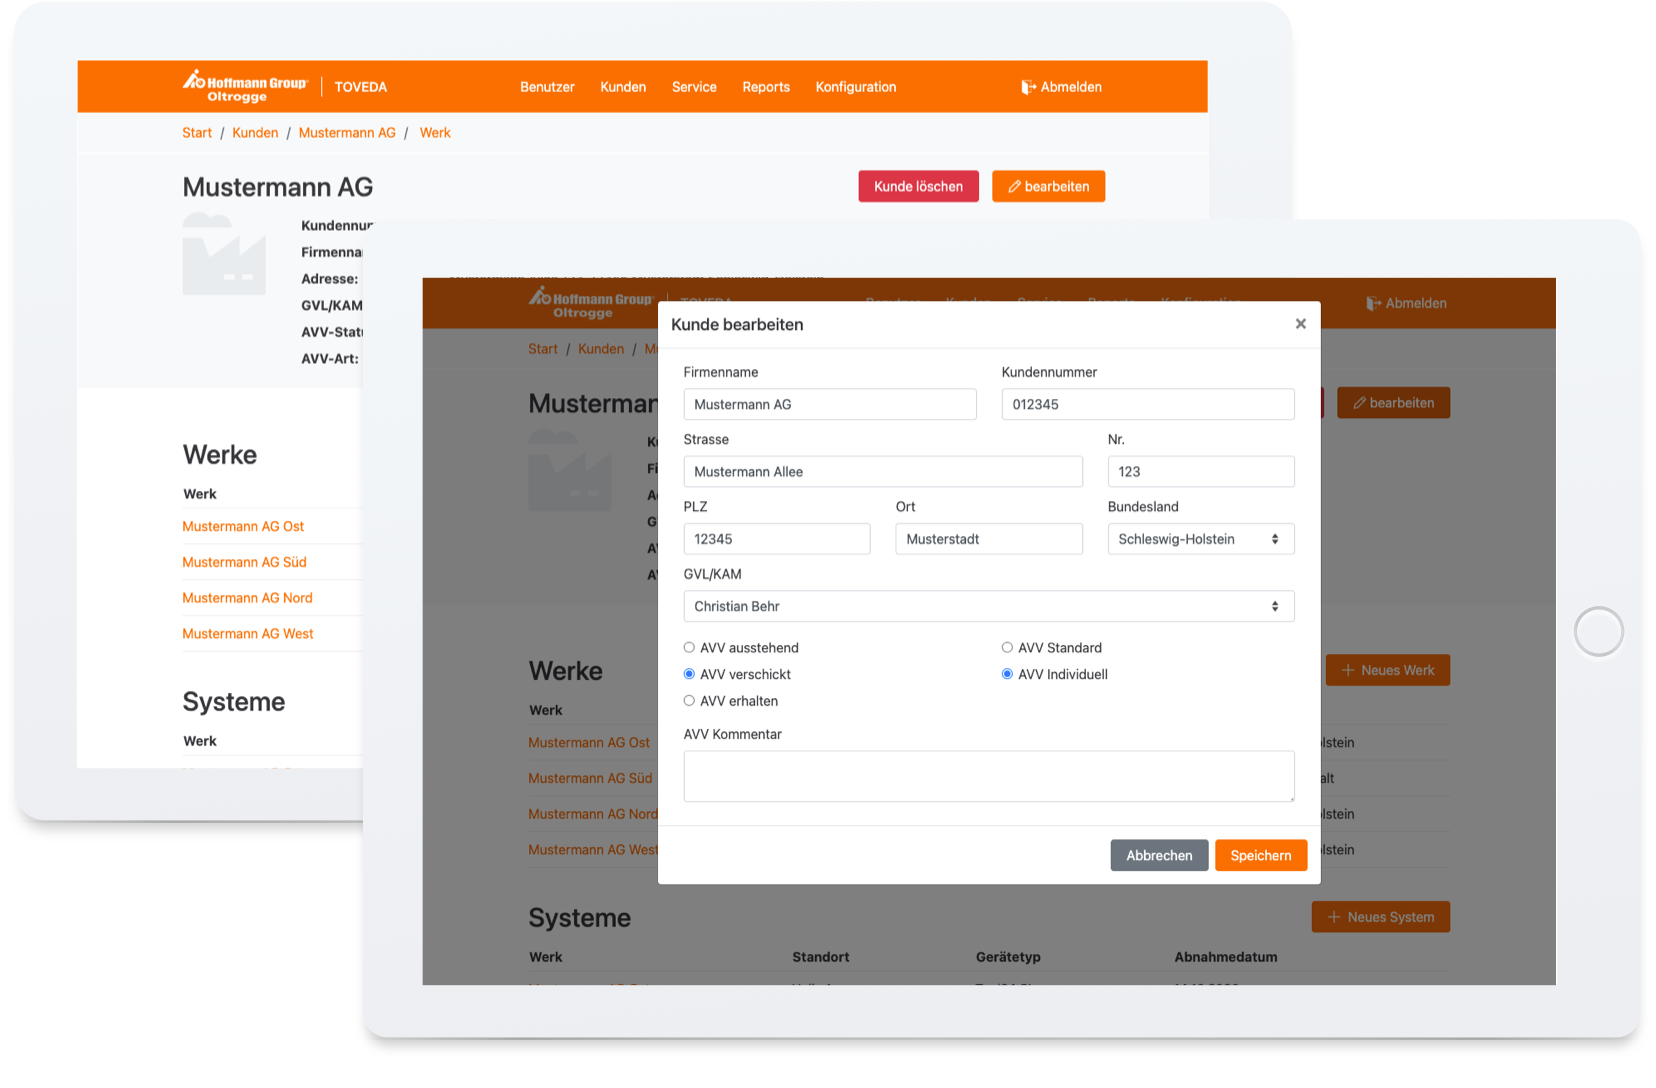 TOVEDA Webapplikation Kundenverwaltung auf Tablet